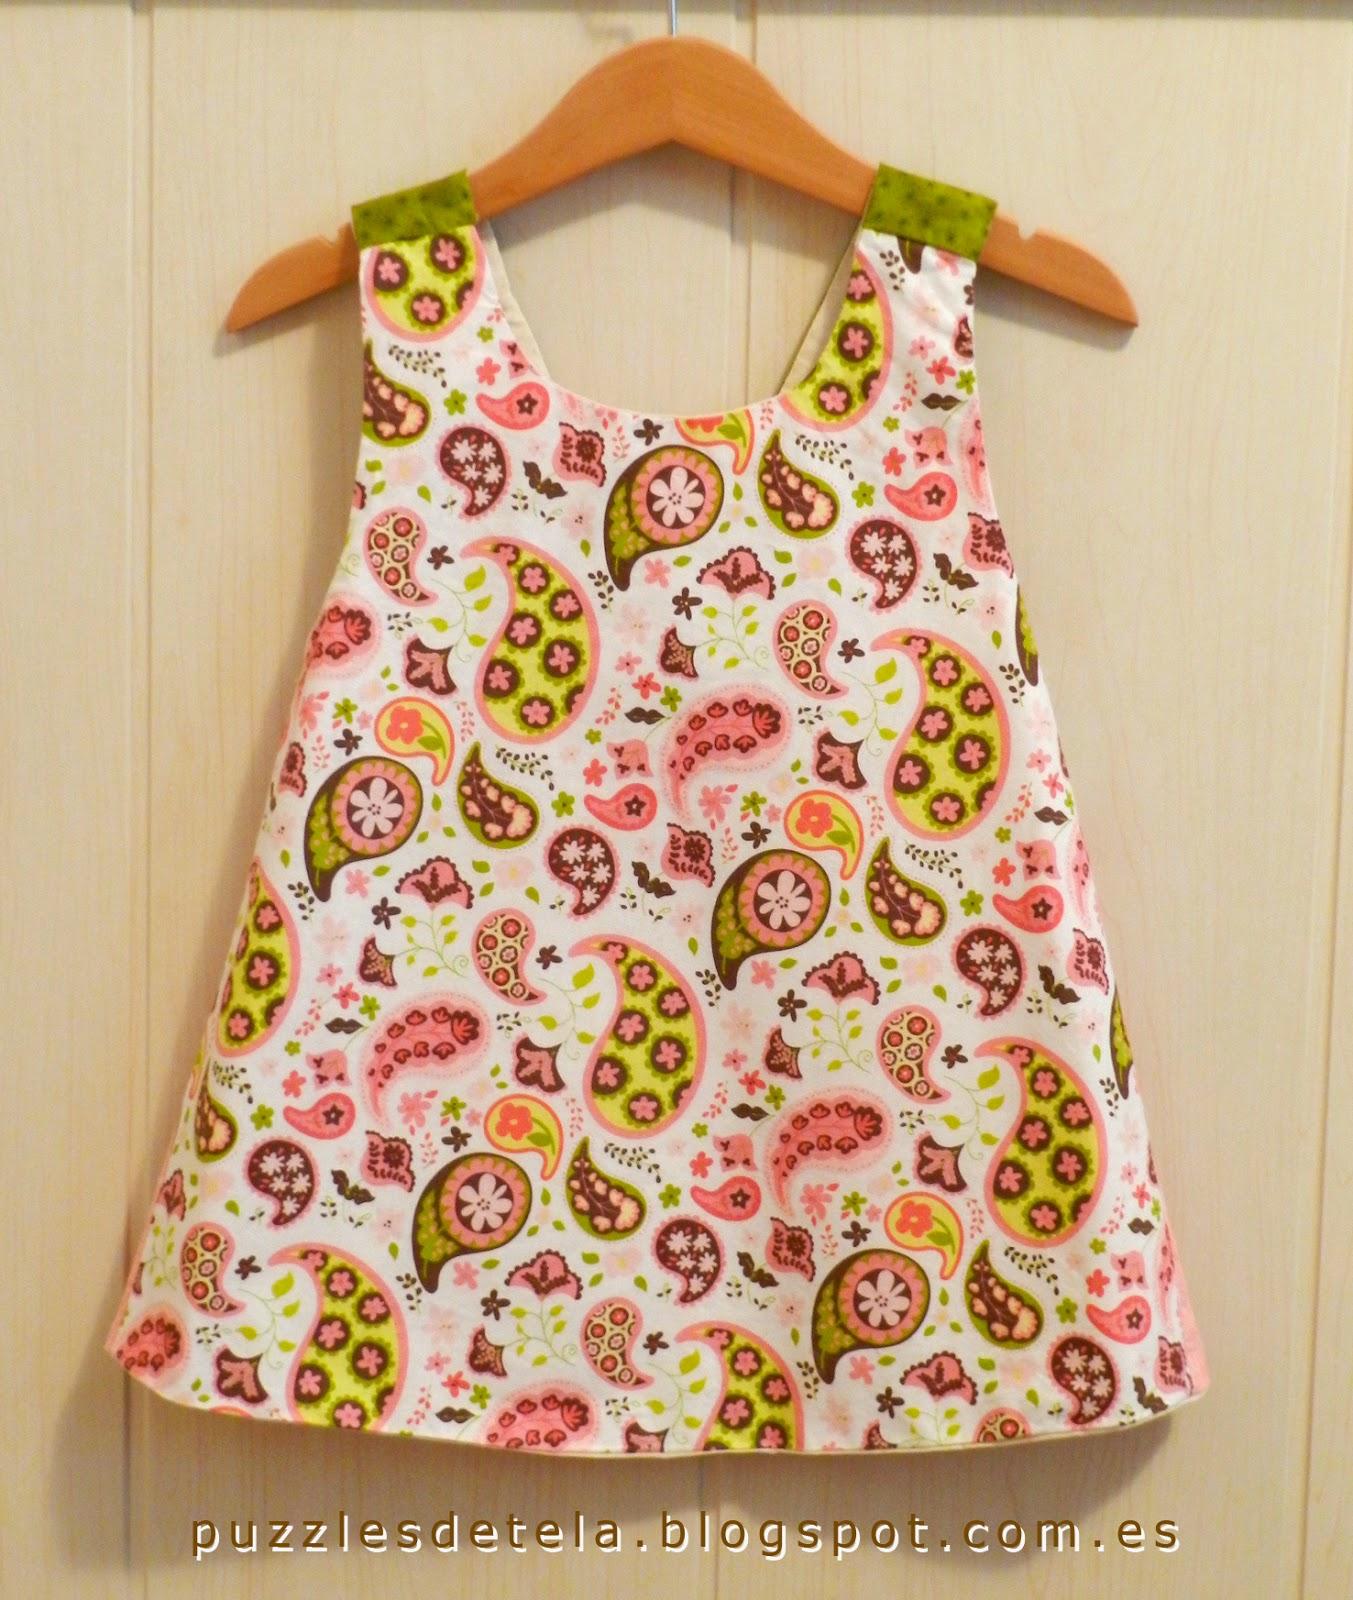 Pinafore dress, vestido verano, ropa infantil, ropa niña, patchwork, blusa verano, Cosotela,Pinafore dress, vestido verano, ropa infantil, ropa niña, patchwork, blusa verano, Cosotela,